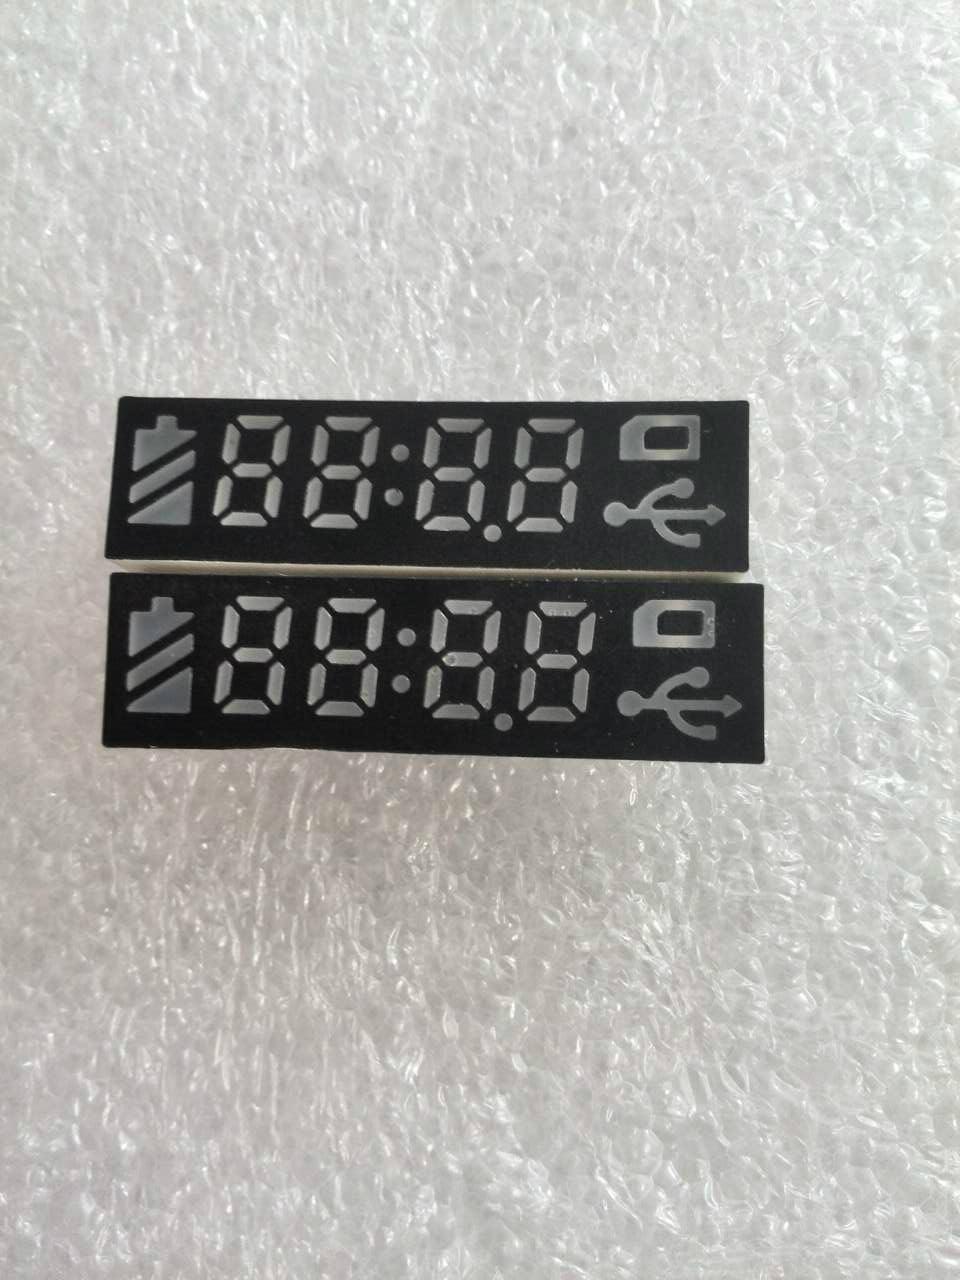 LED數碼屏 1